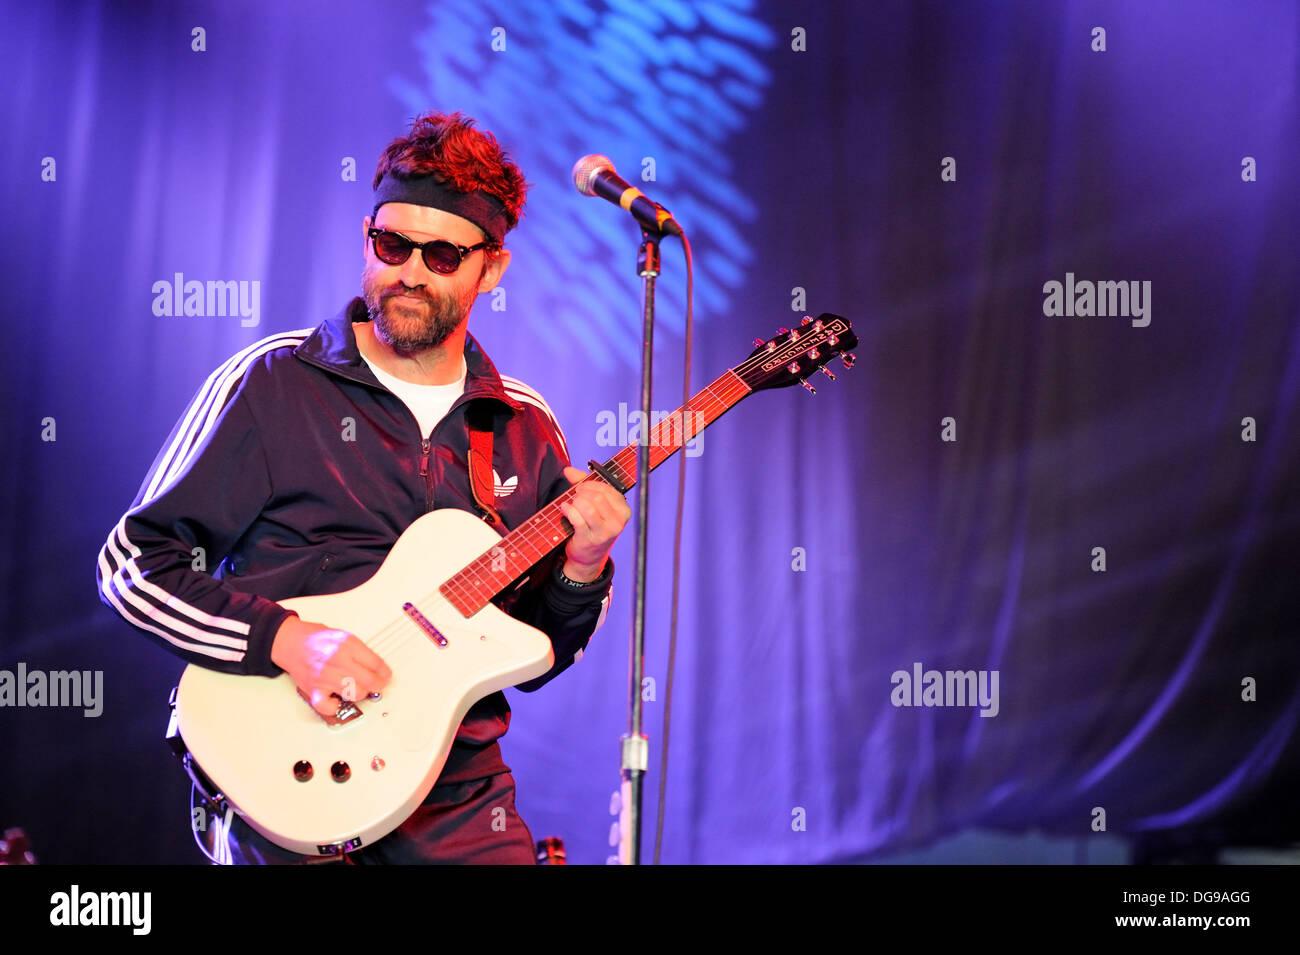 Mark Oliver Everett E Of American Alternative Rock Band Eels Stock Photo Alamy